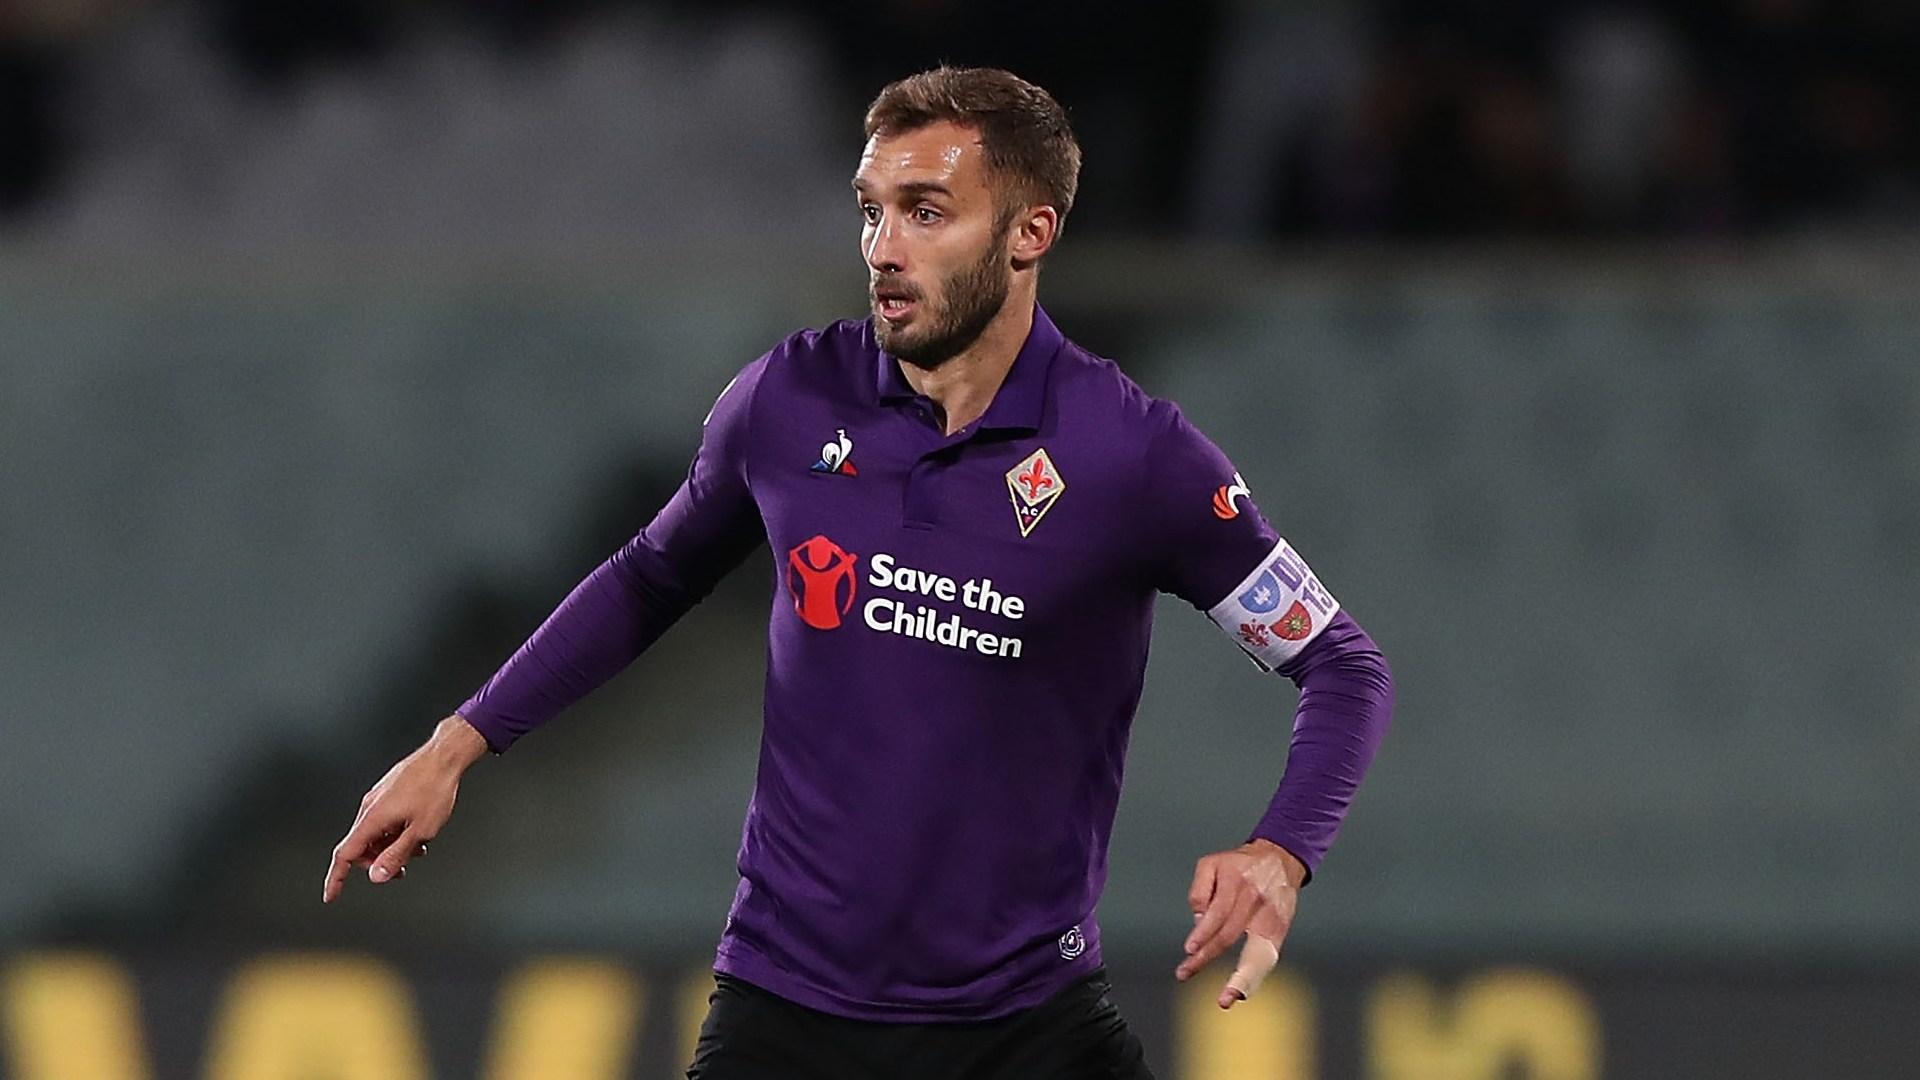 Fiorentina, parla capitan Pezzella: